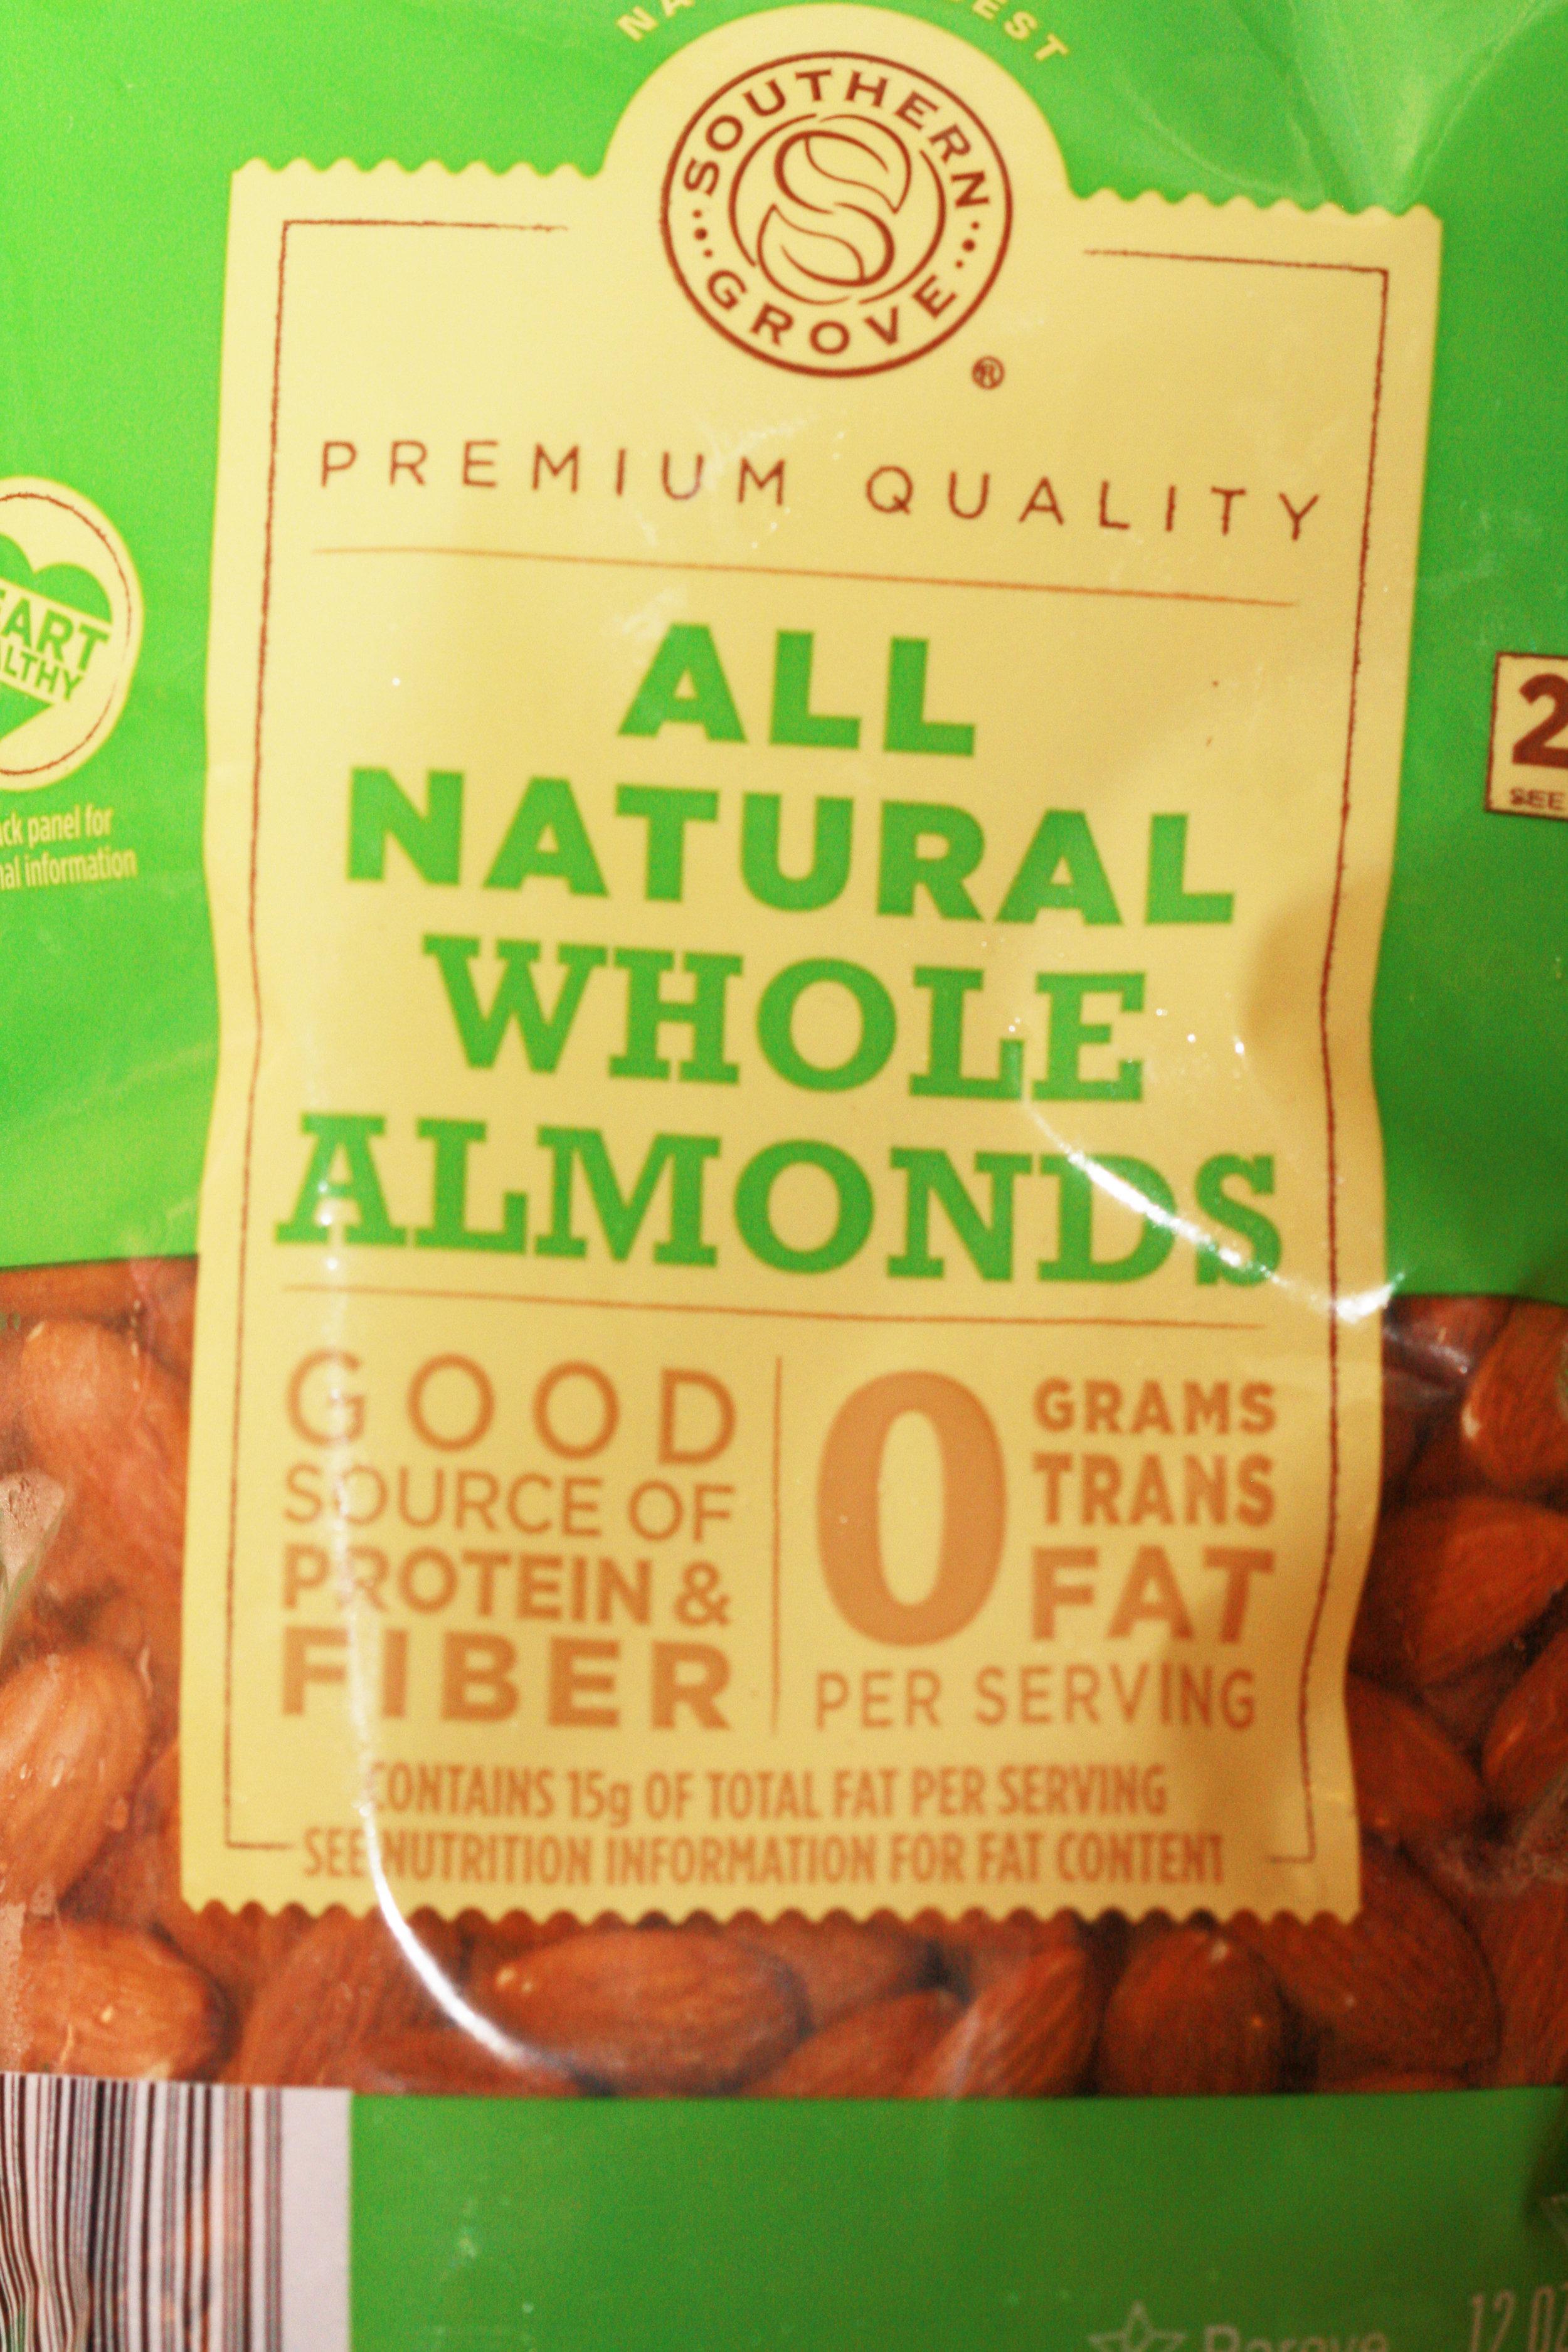 Yum! Almonds